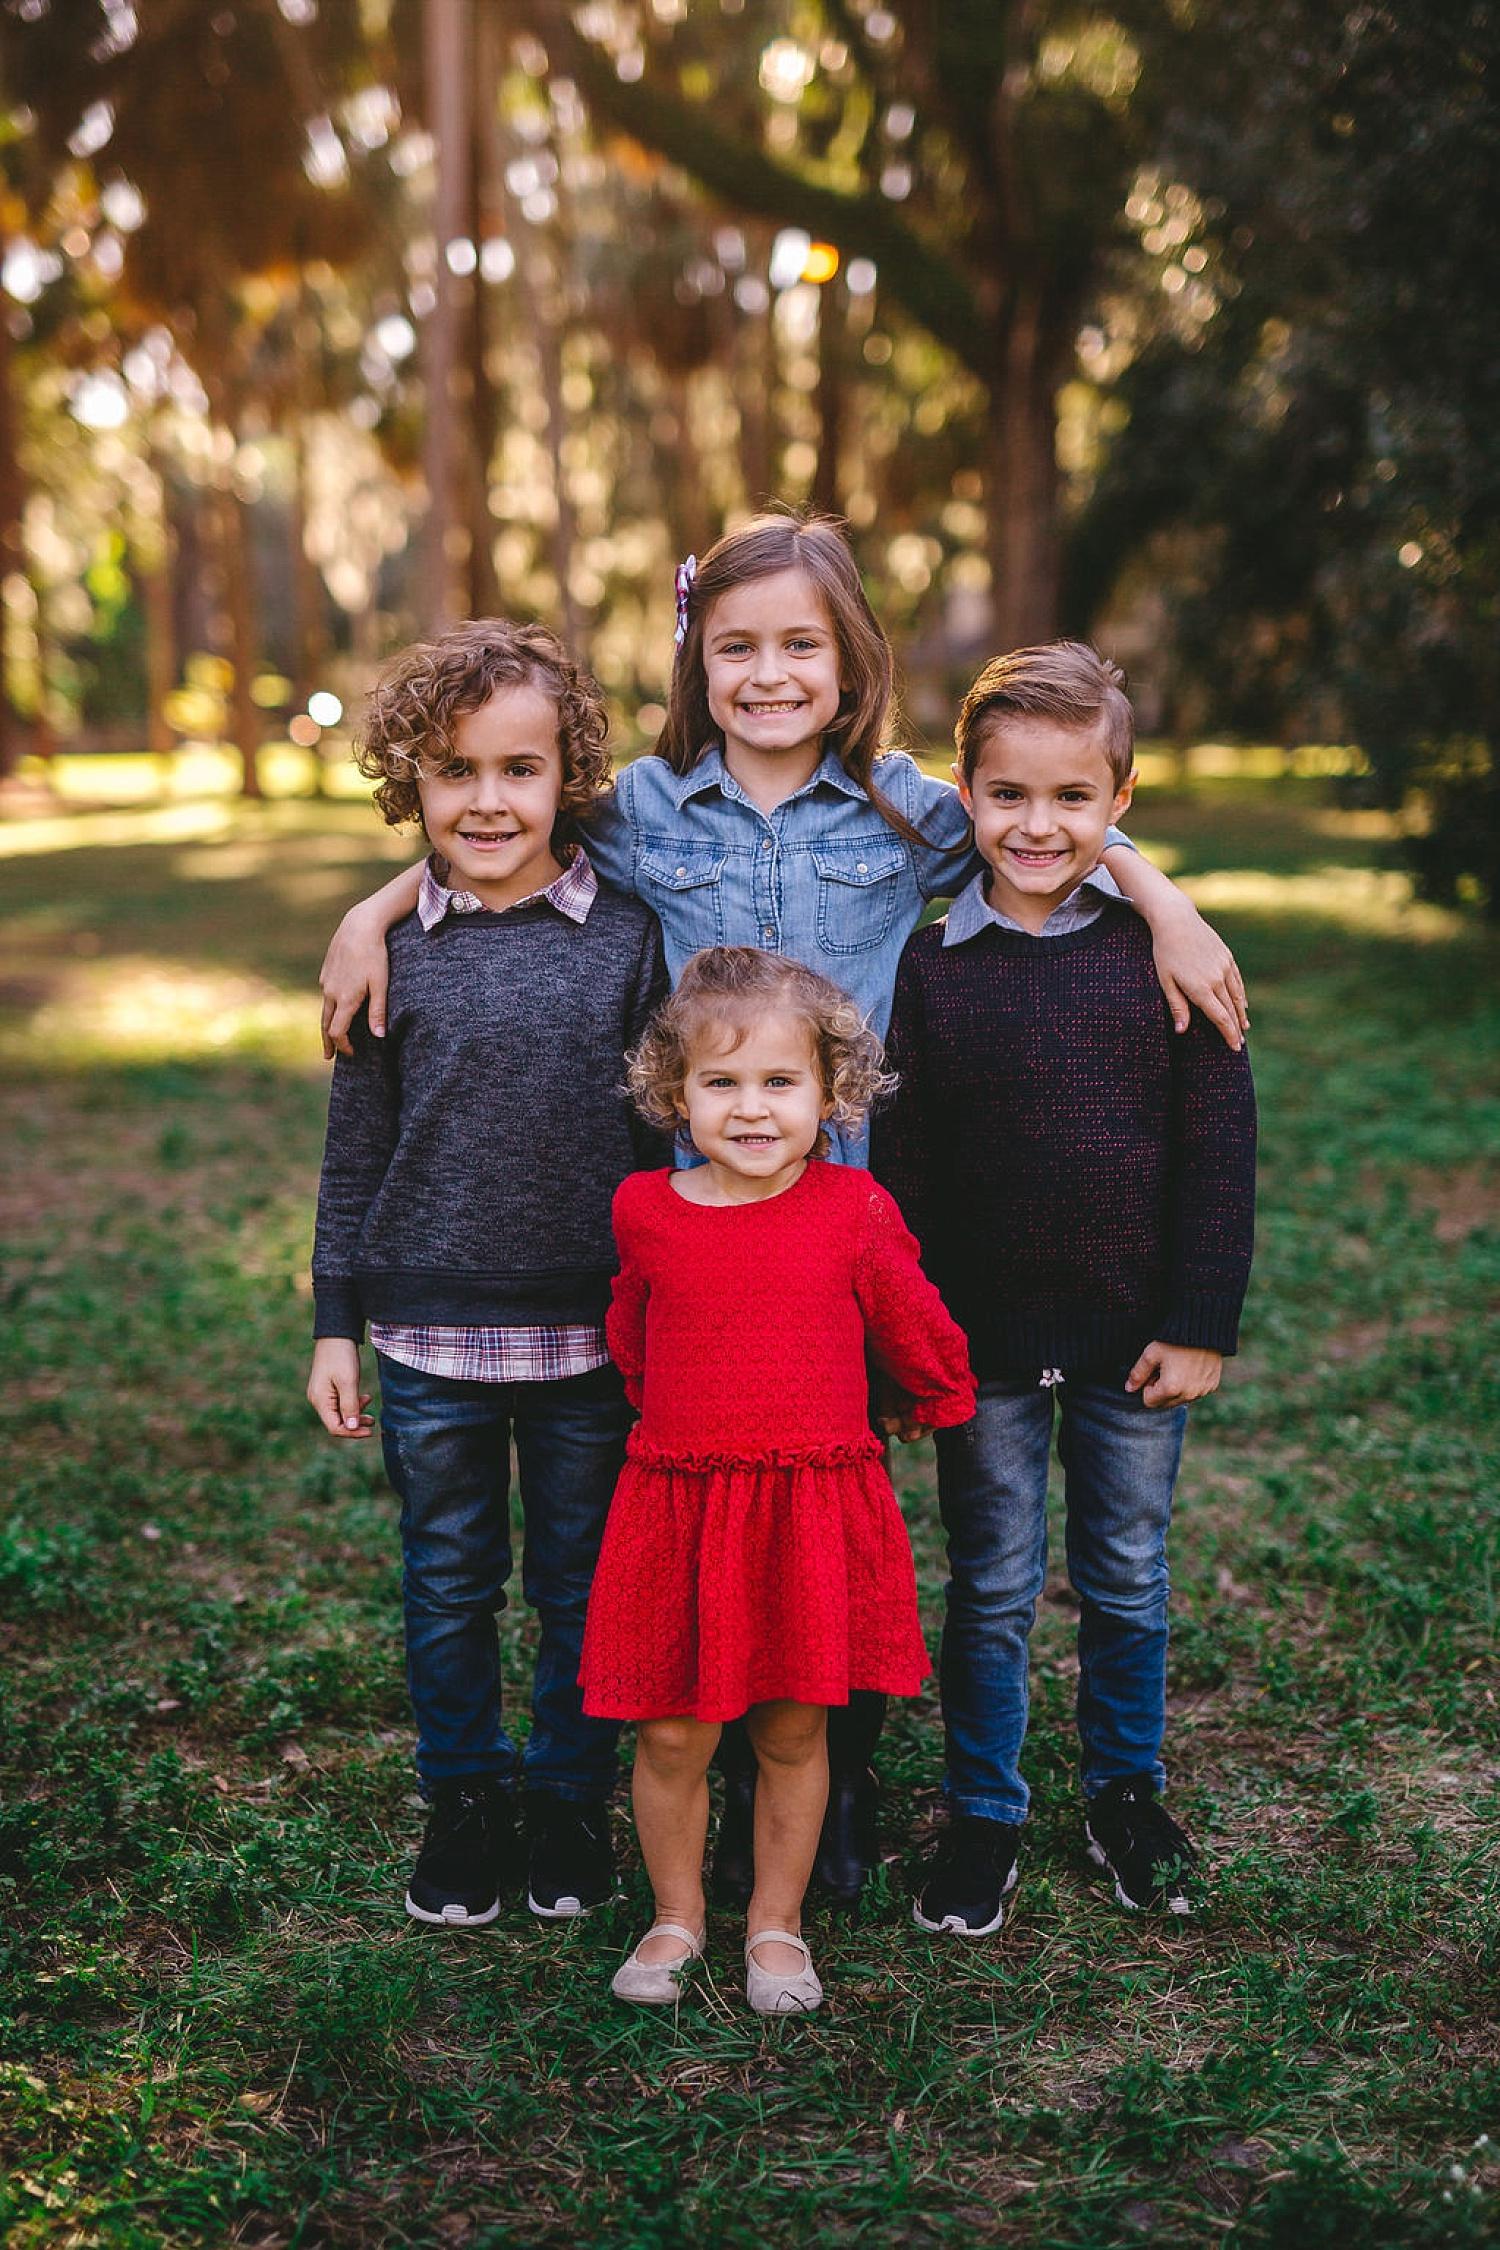 HighlightStudios-LifestyleFamilyPhotos-LaPortaFamily-52_South Tampa Family Photo Session.jpg